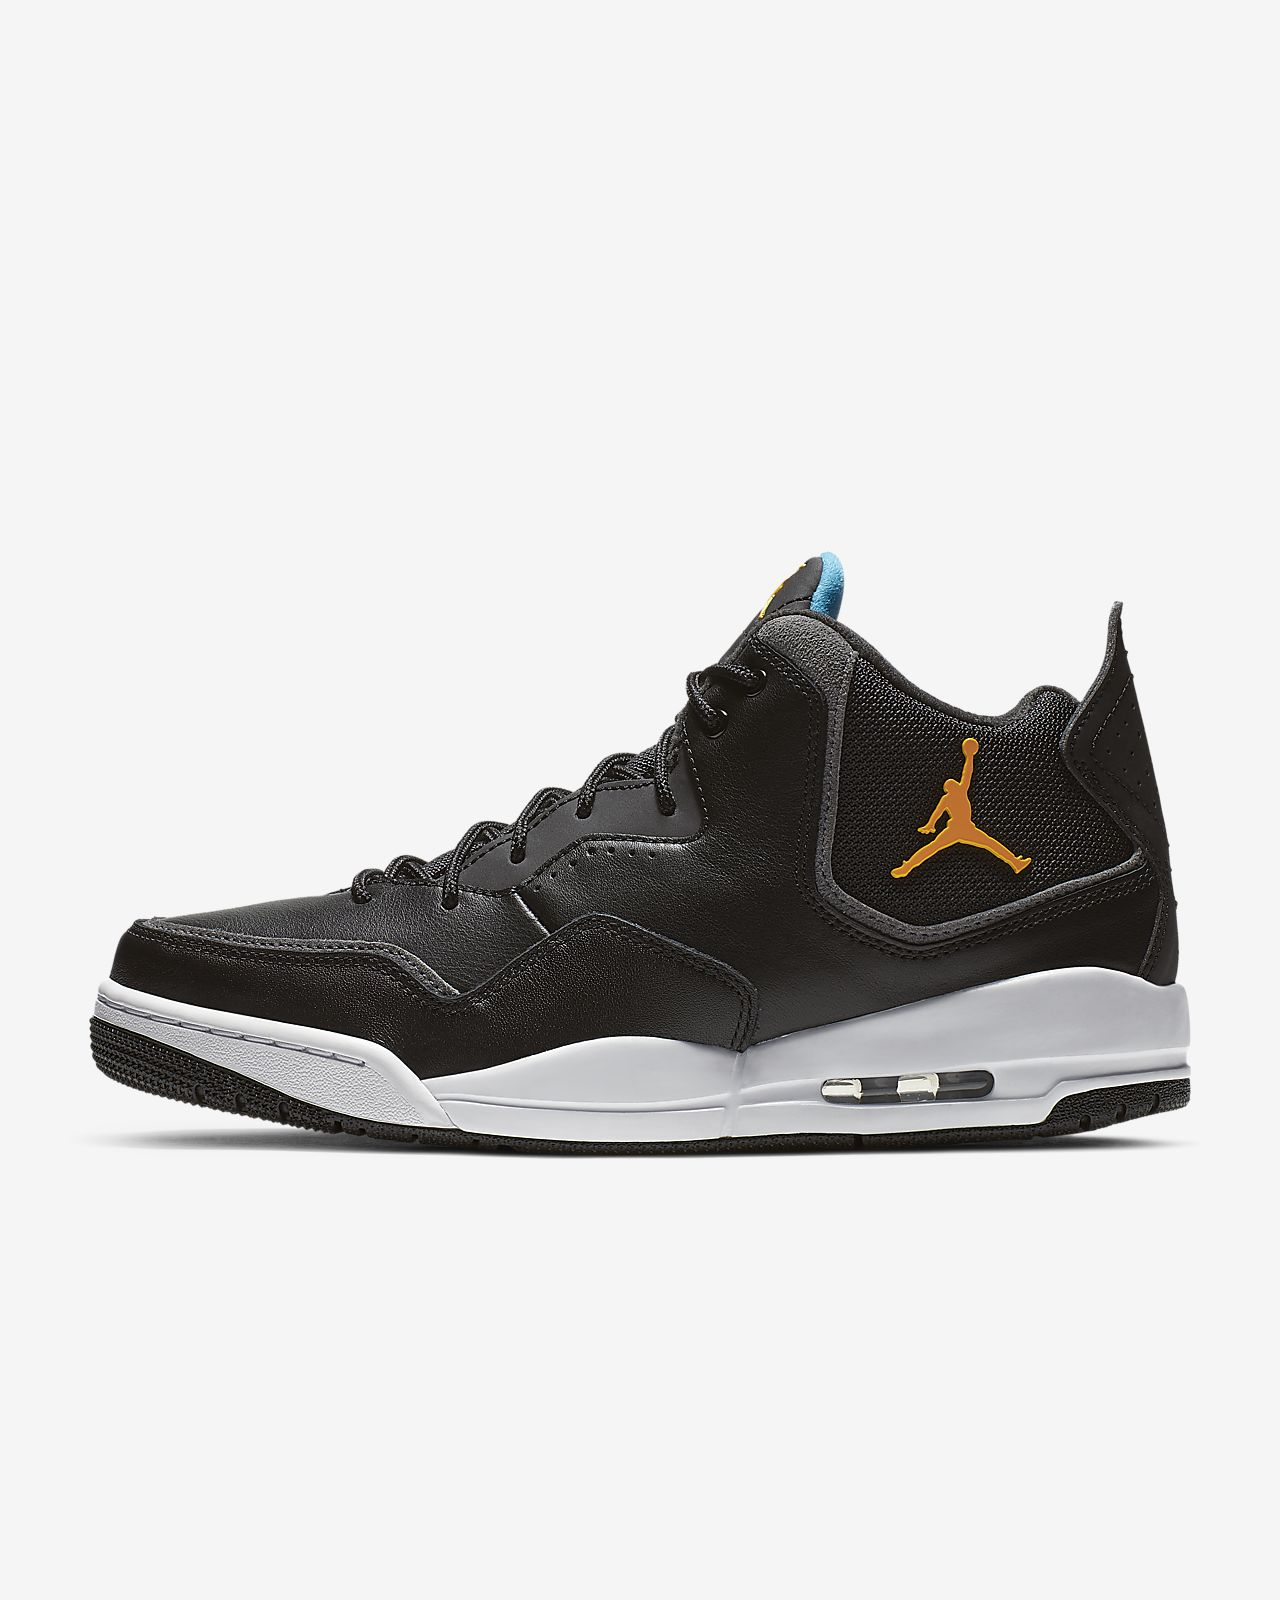 8b050bf1507 Pánská bota Jordan Courtside 23. Nike.com CZ